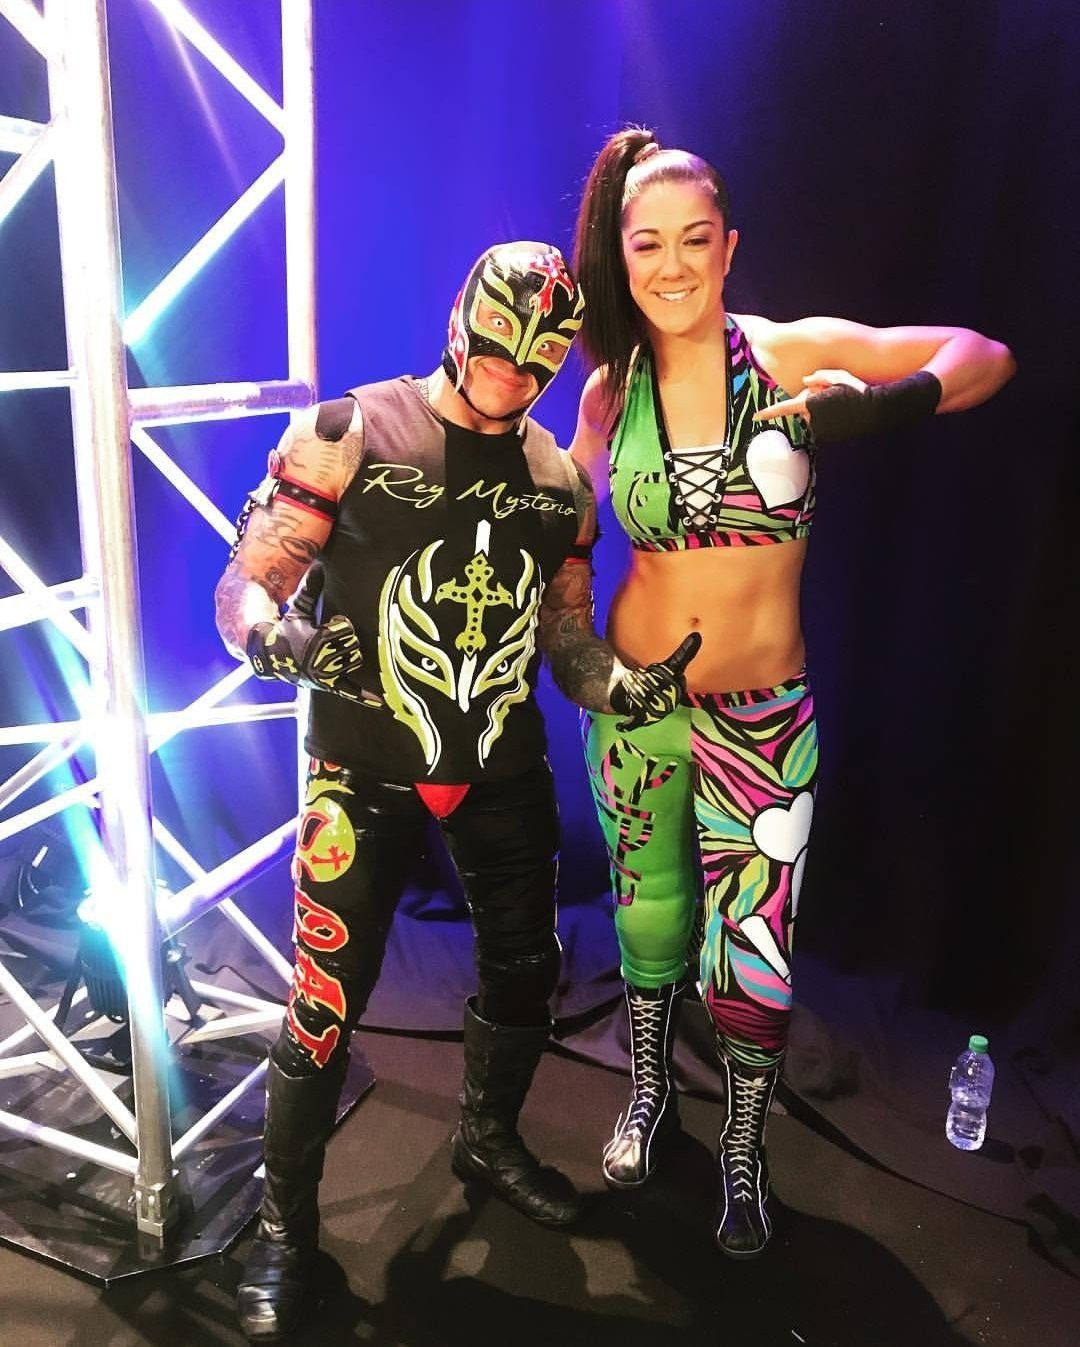 Bayley Rey Mystero Wwe Female Wrestlers Wrestling Superstars